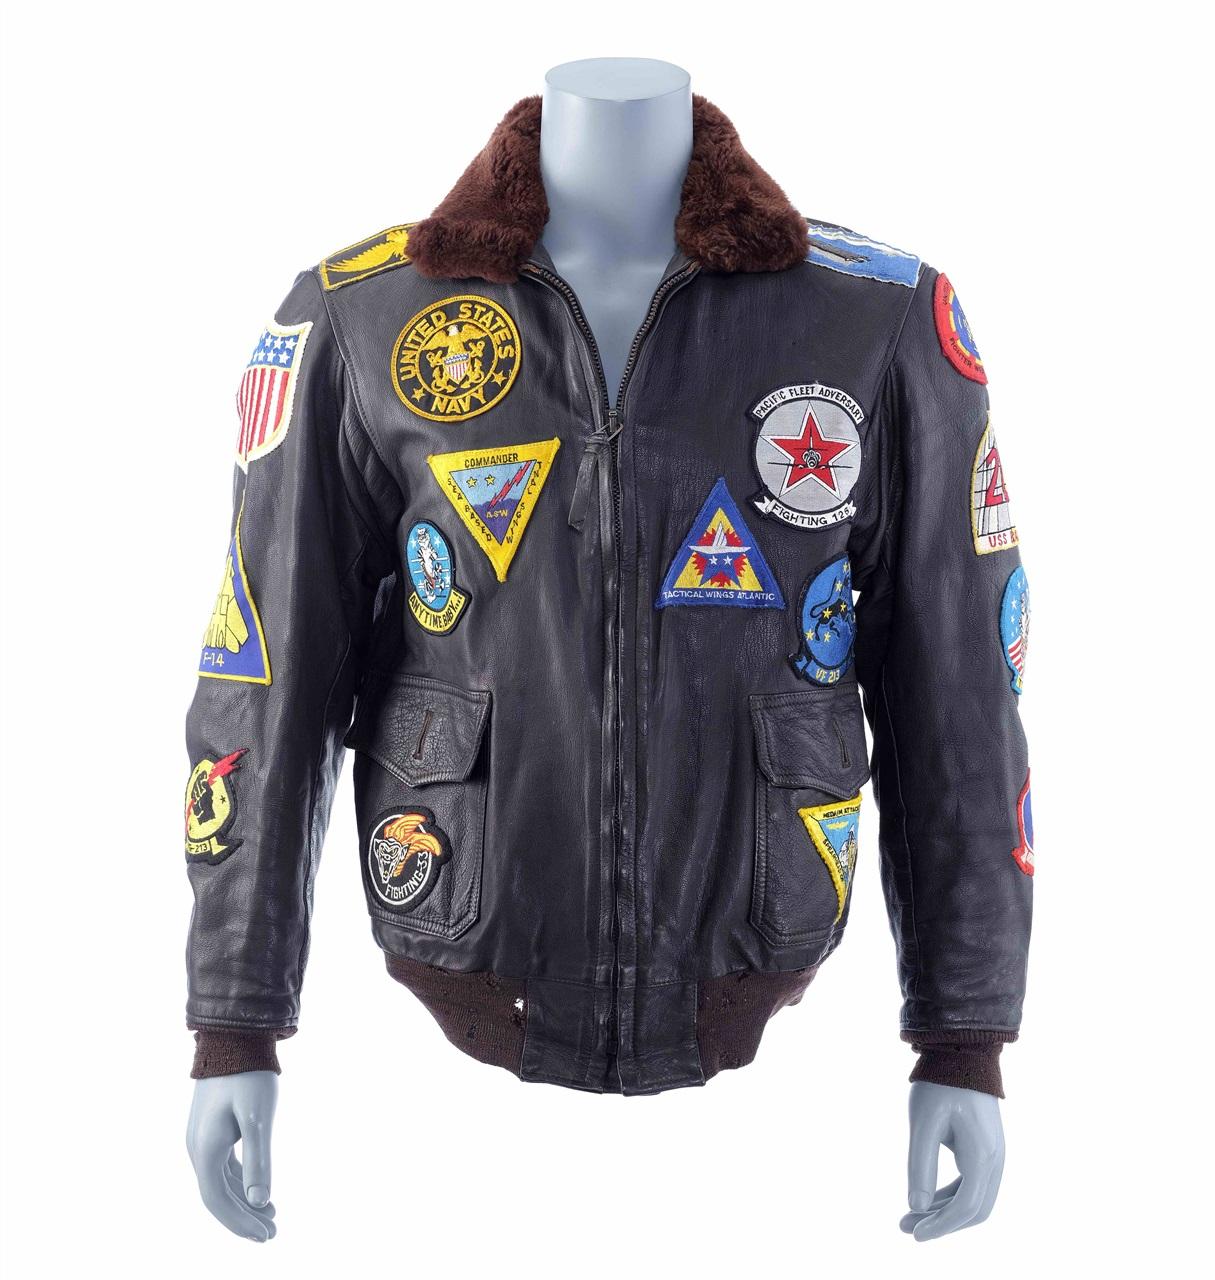 La bomber jacket di Pete 'Maverick' Mitchell - Neomag.